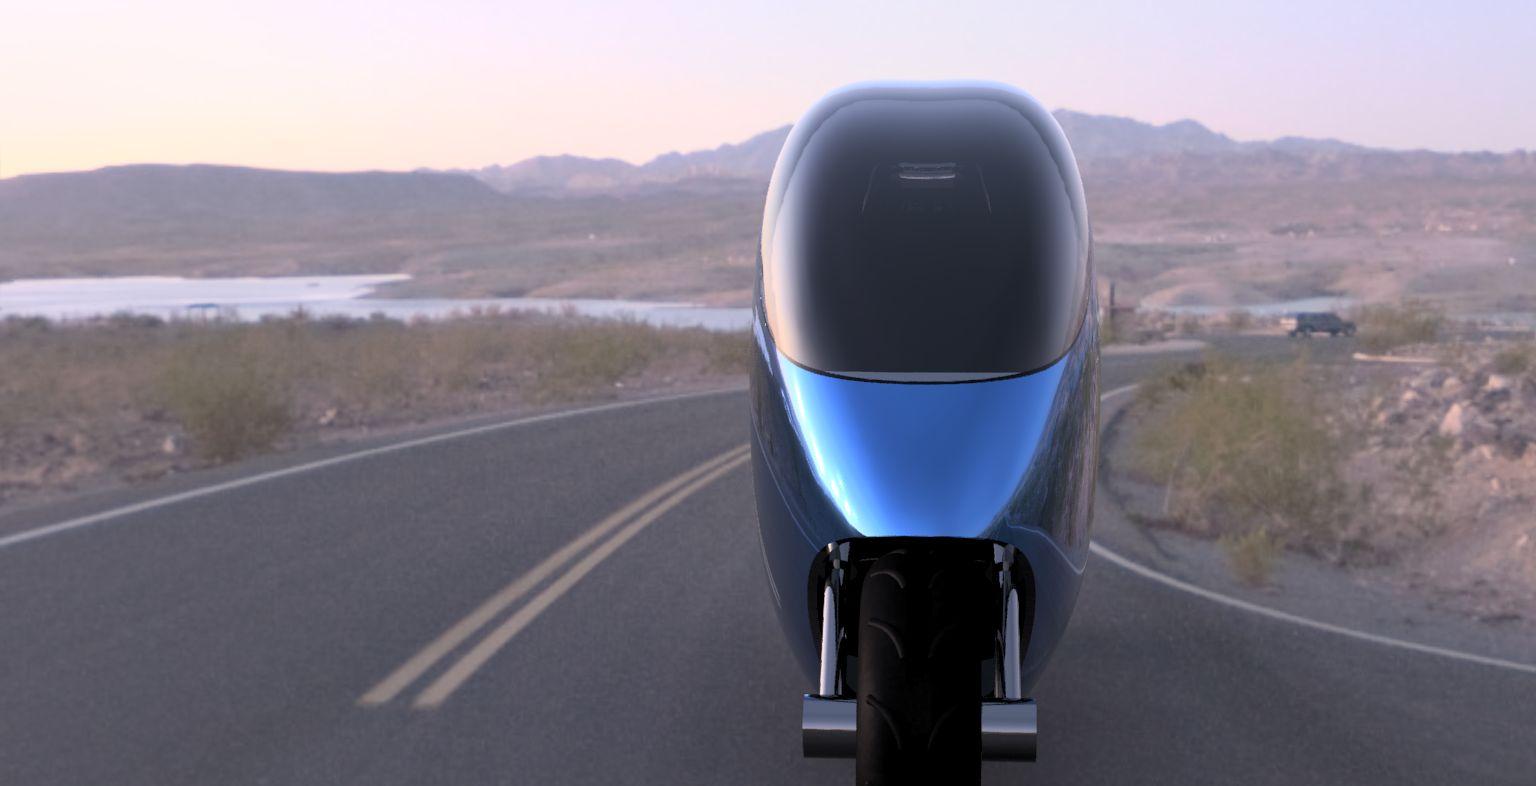 Self-balance-smart-bike-assembled-v14-2-3500-3500